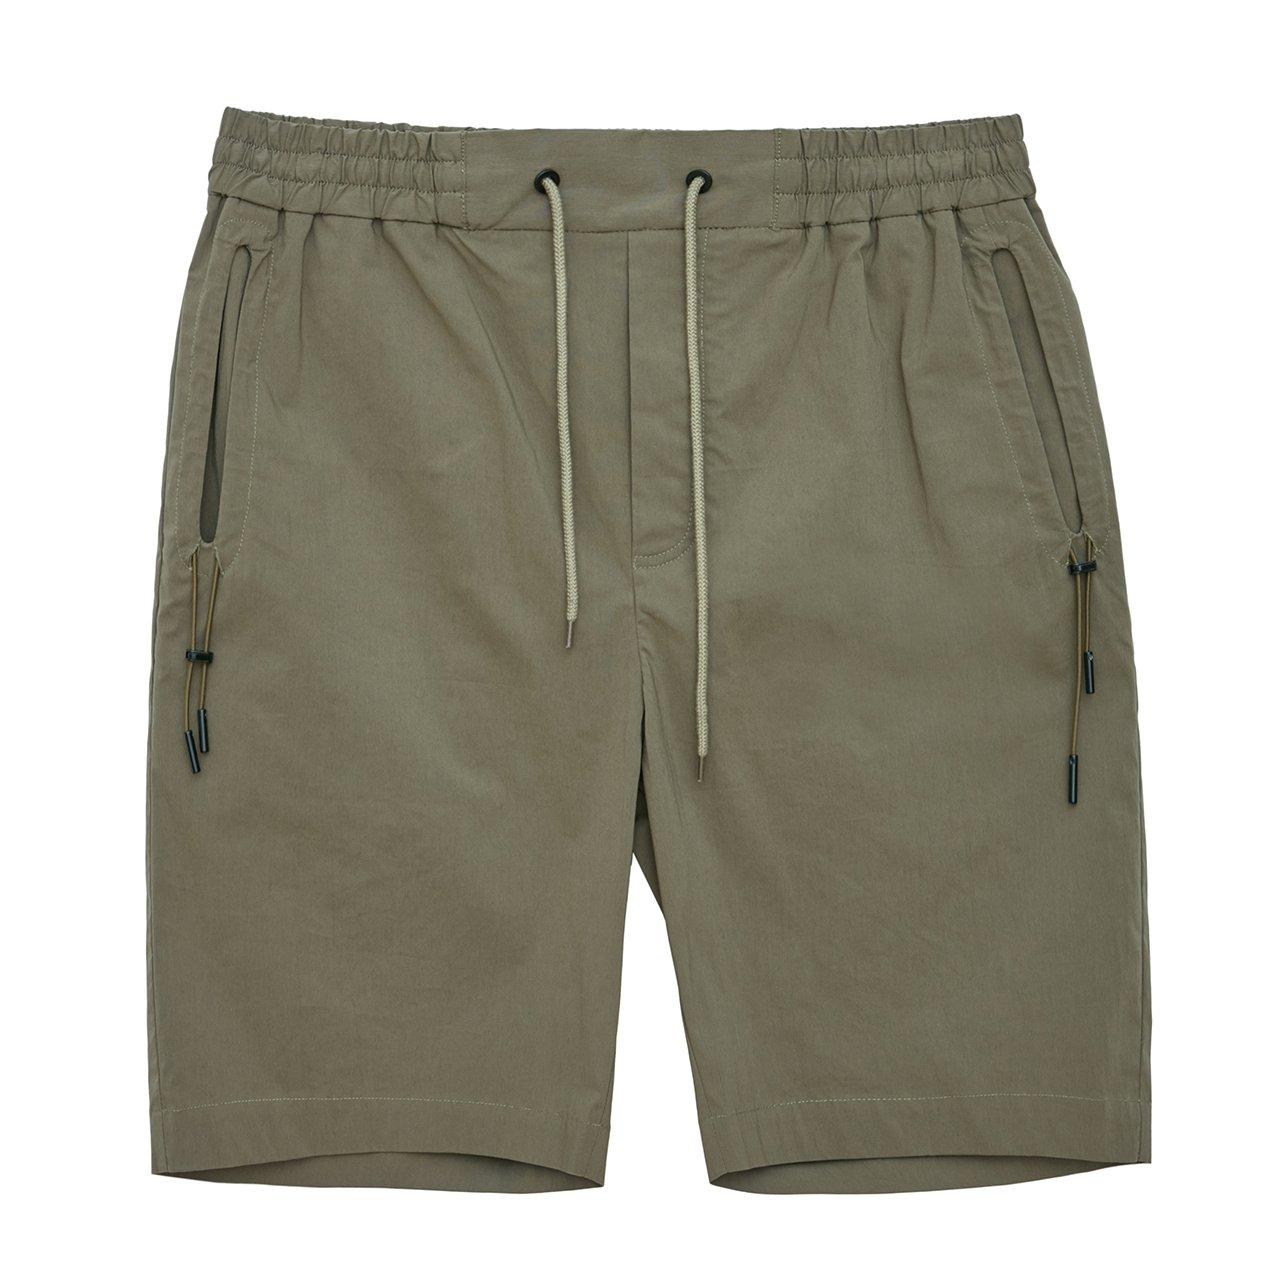 ACzeg Shorts Männer Sommer Casual Strand